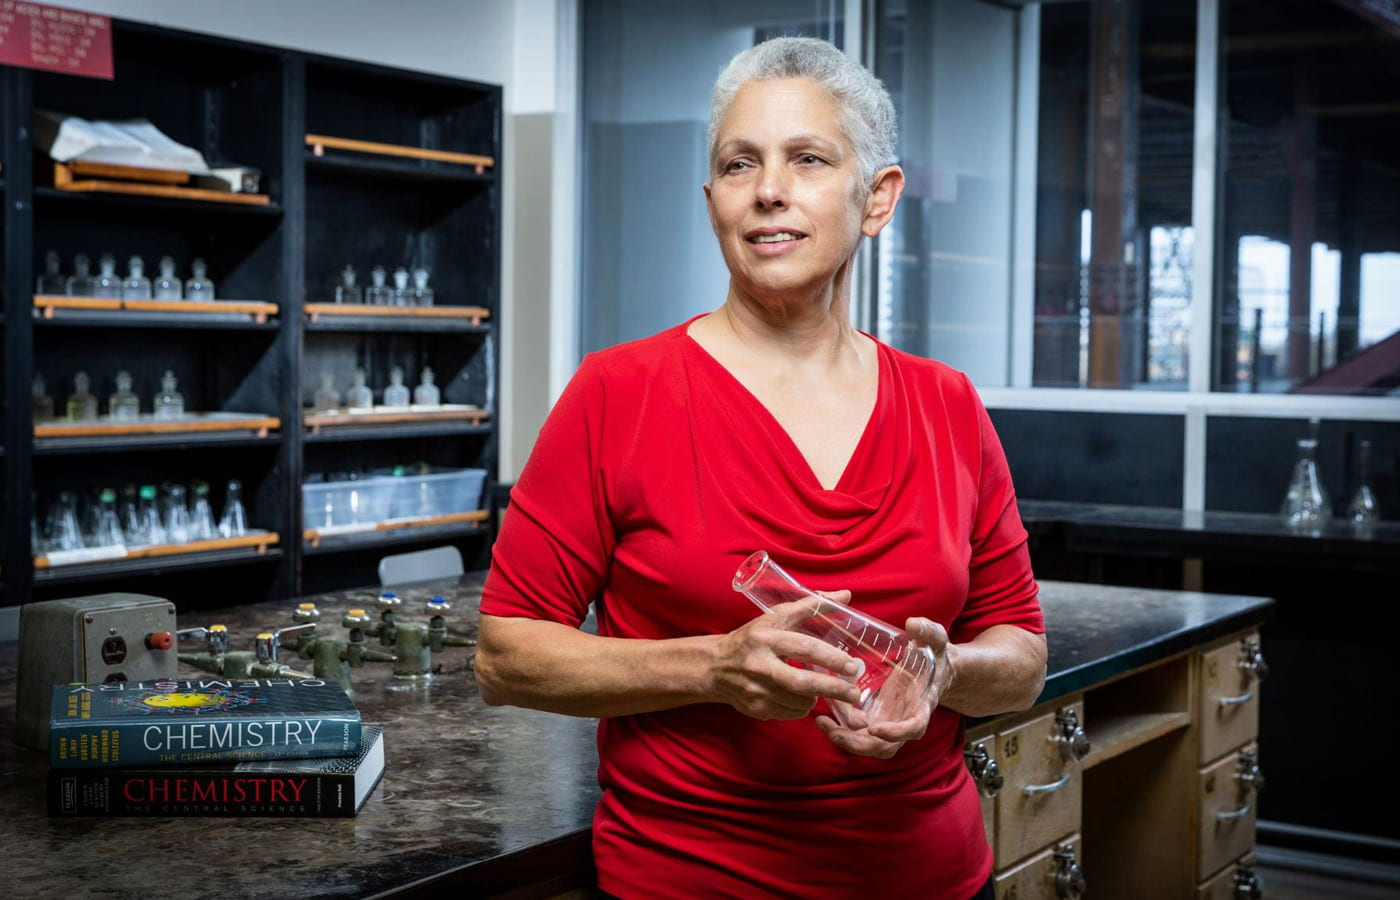 Karen Singmaster, chair of SJSU's Department of Chemistry.